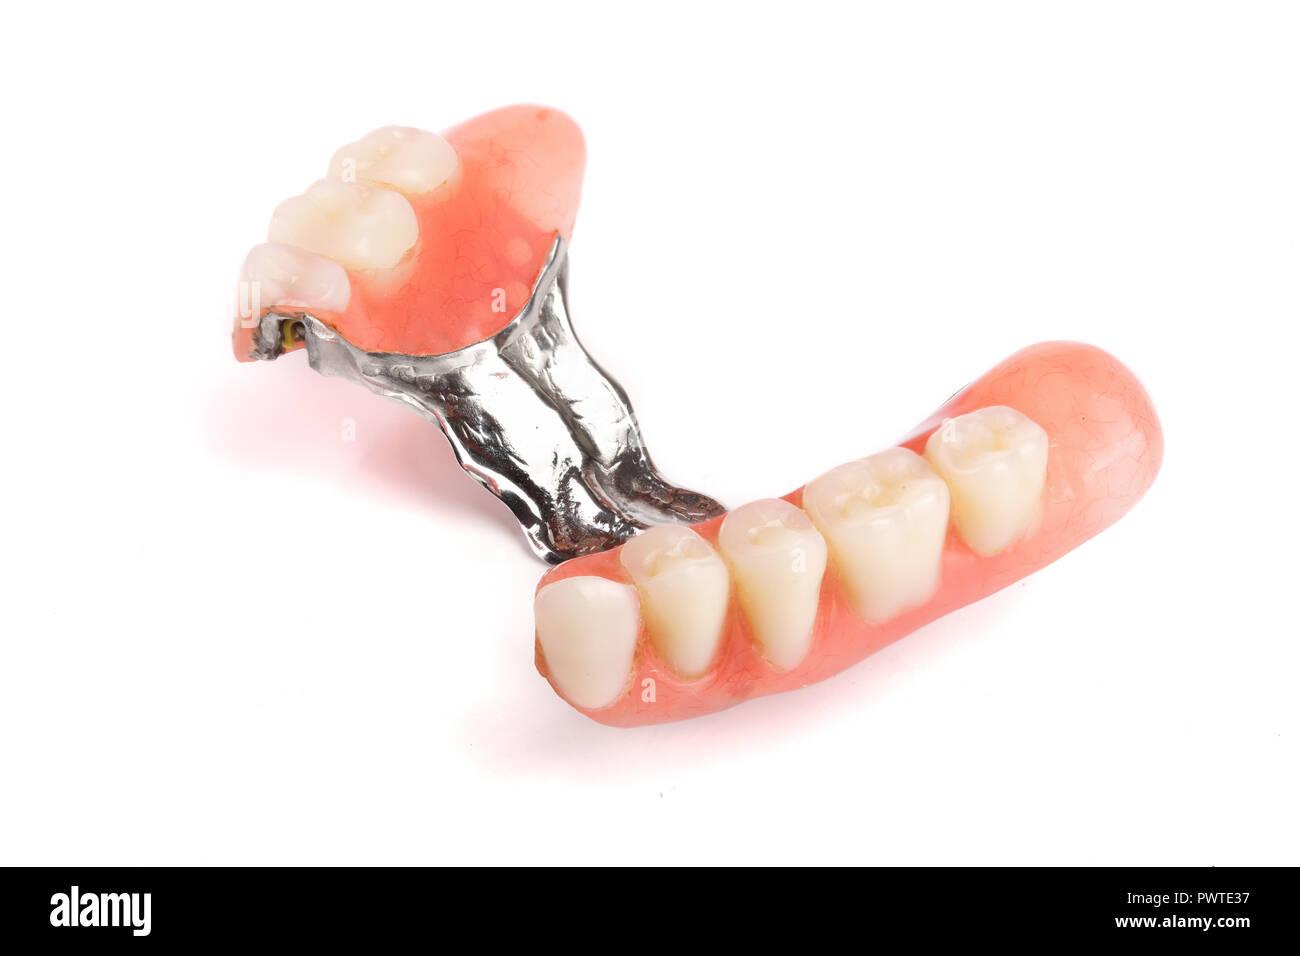 Clasp prosthesis with lock fixation isolated on white background macro. - Stock Image